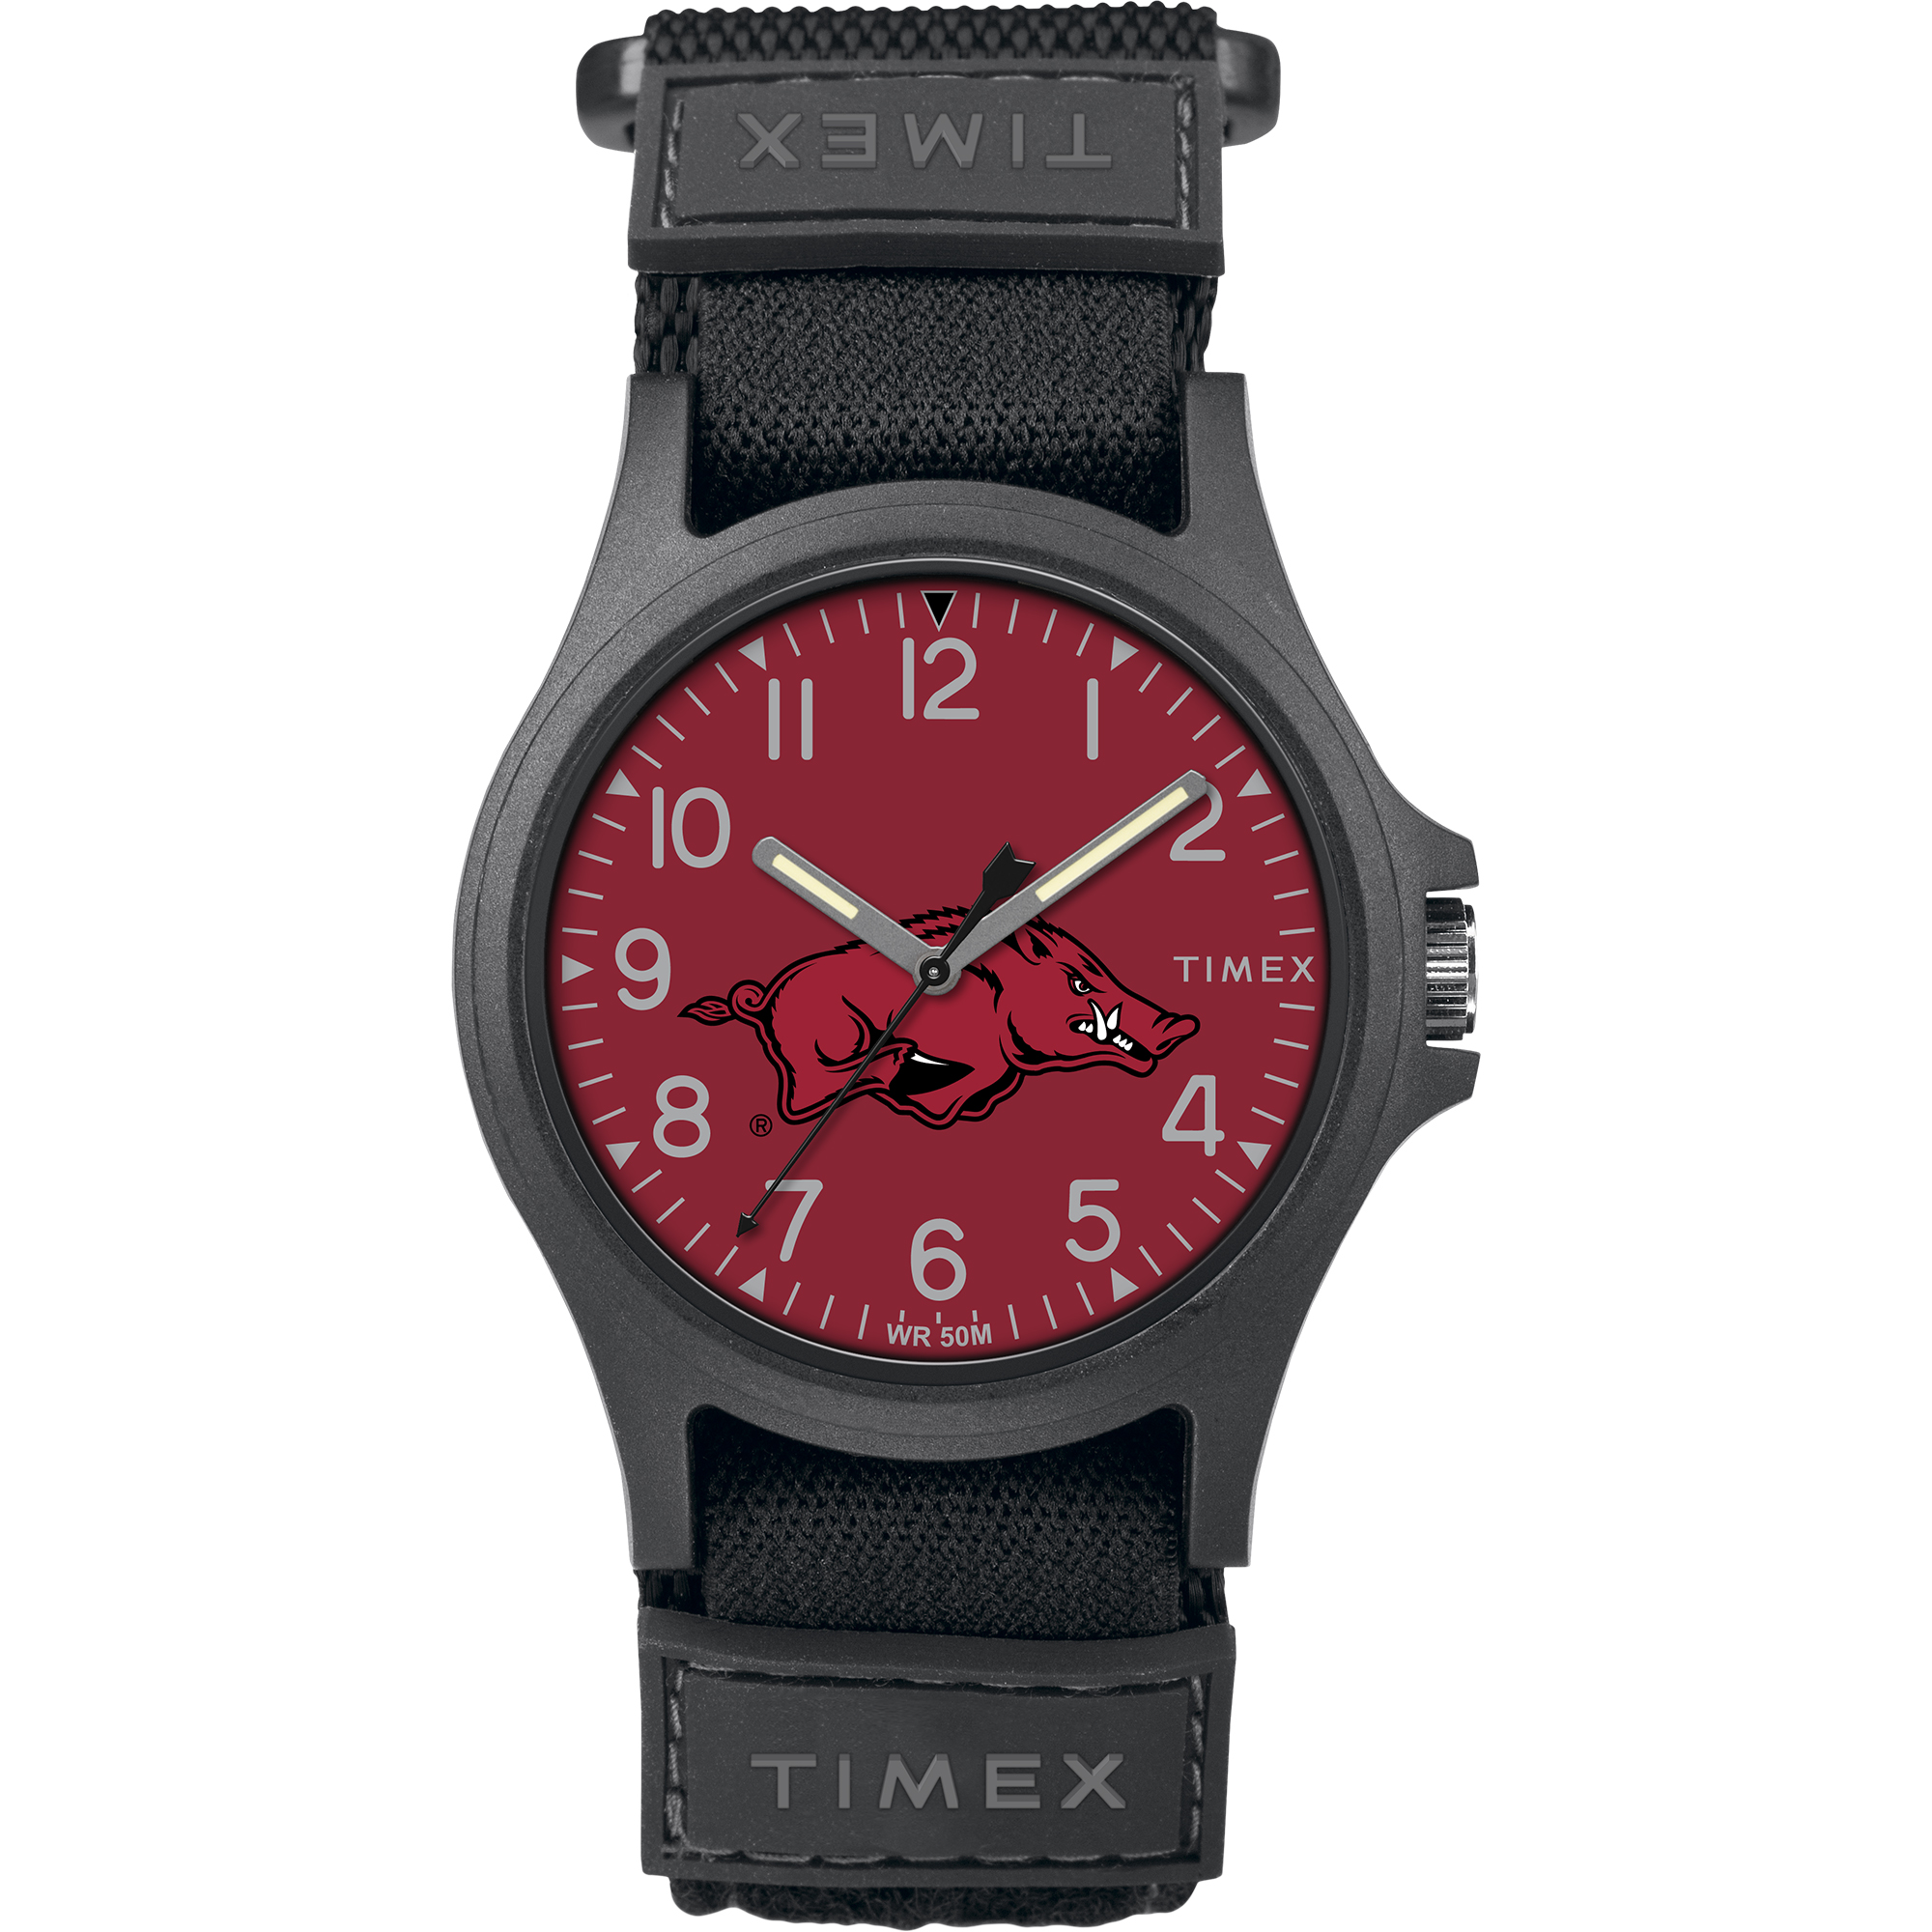 Timex - NCAA Tribute Collection Pride Men's Watch, University of Arkansas Razorbacks